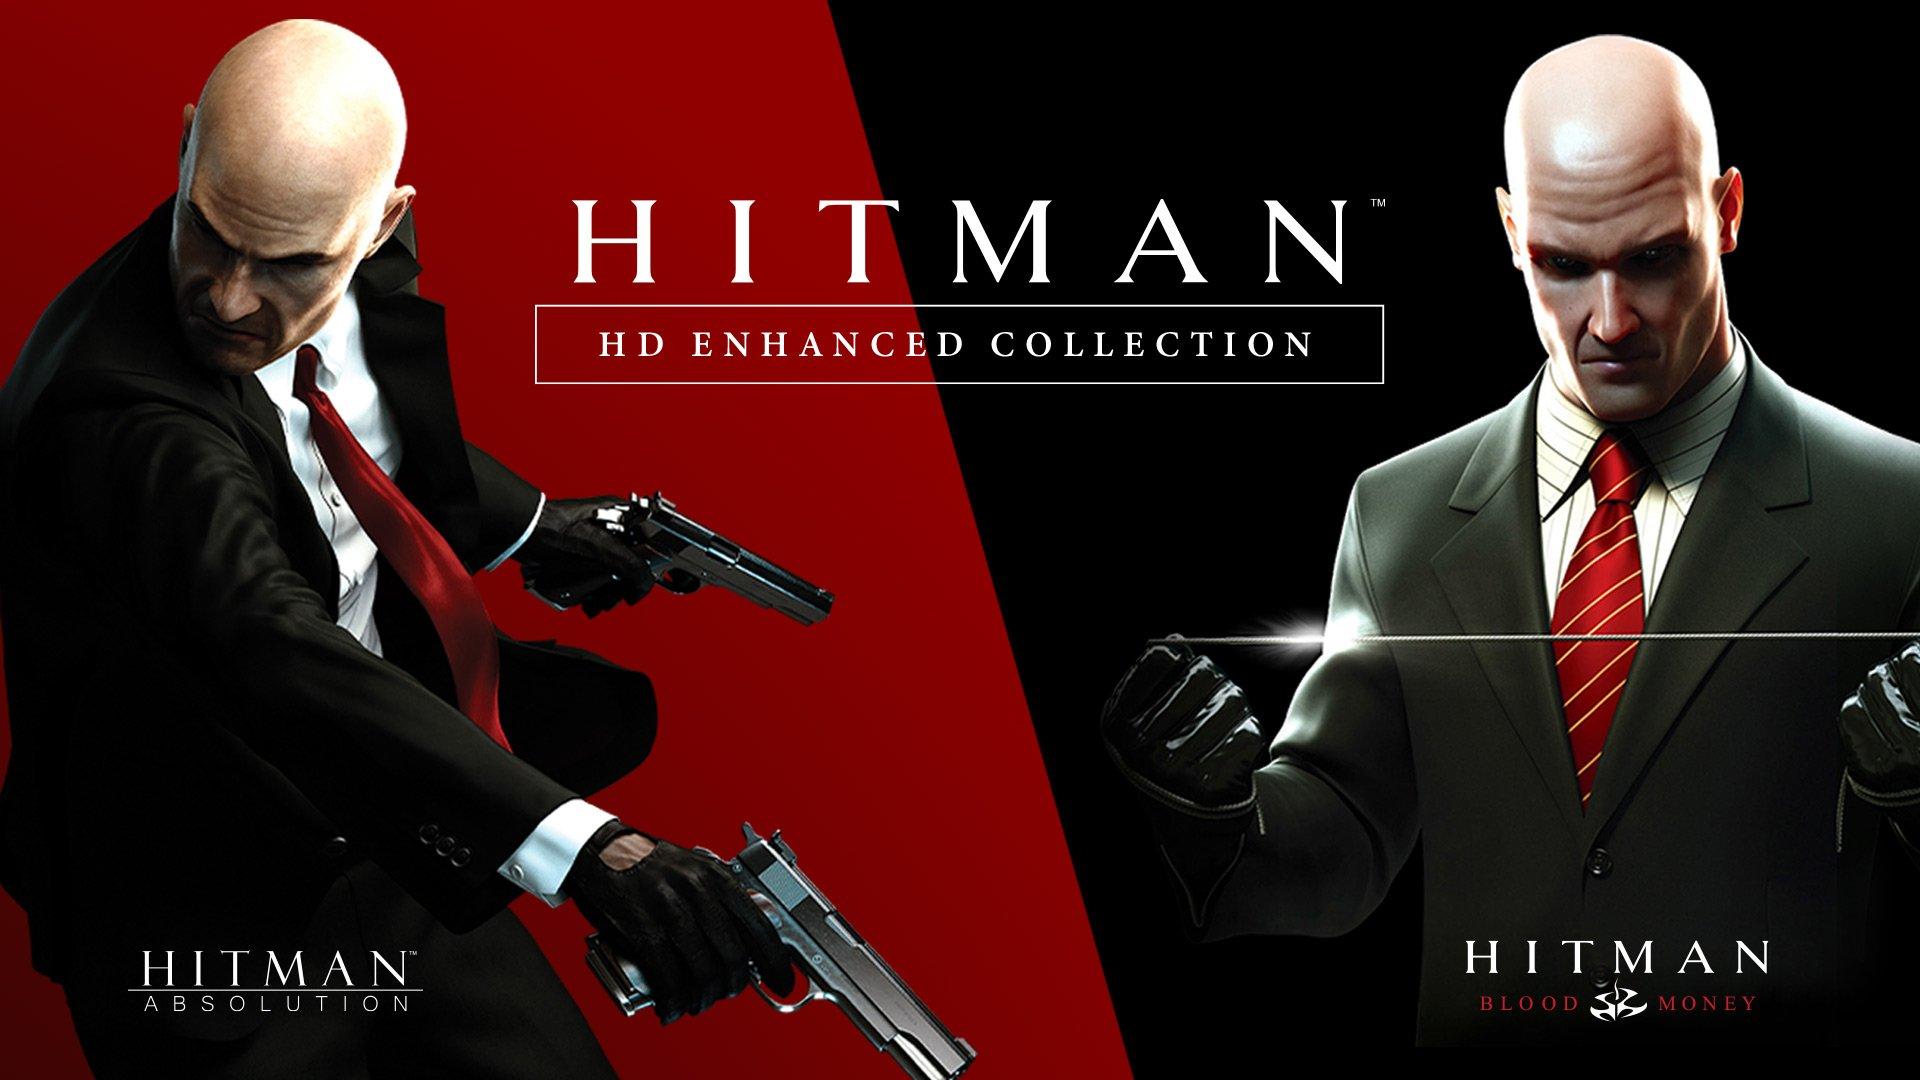 Hitman Hd Enhanced Collection Segera Meluncur Untuk Ps4 Dan Xbox One Gamebrott Com